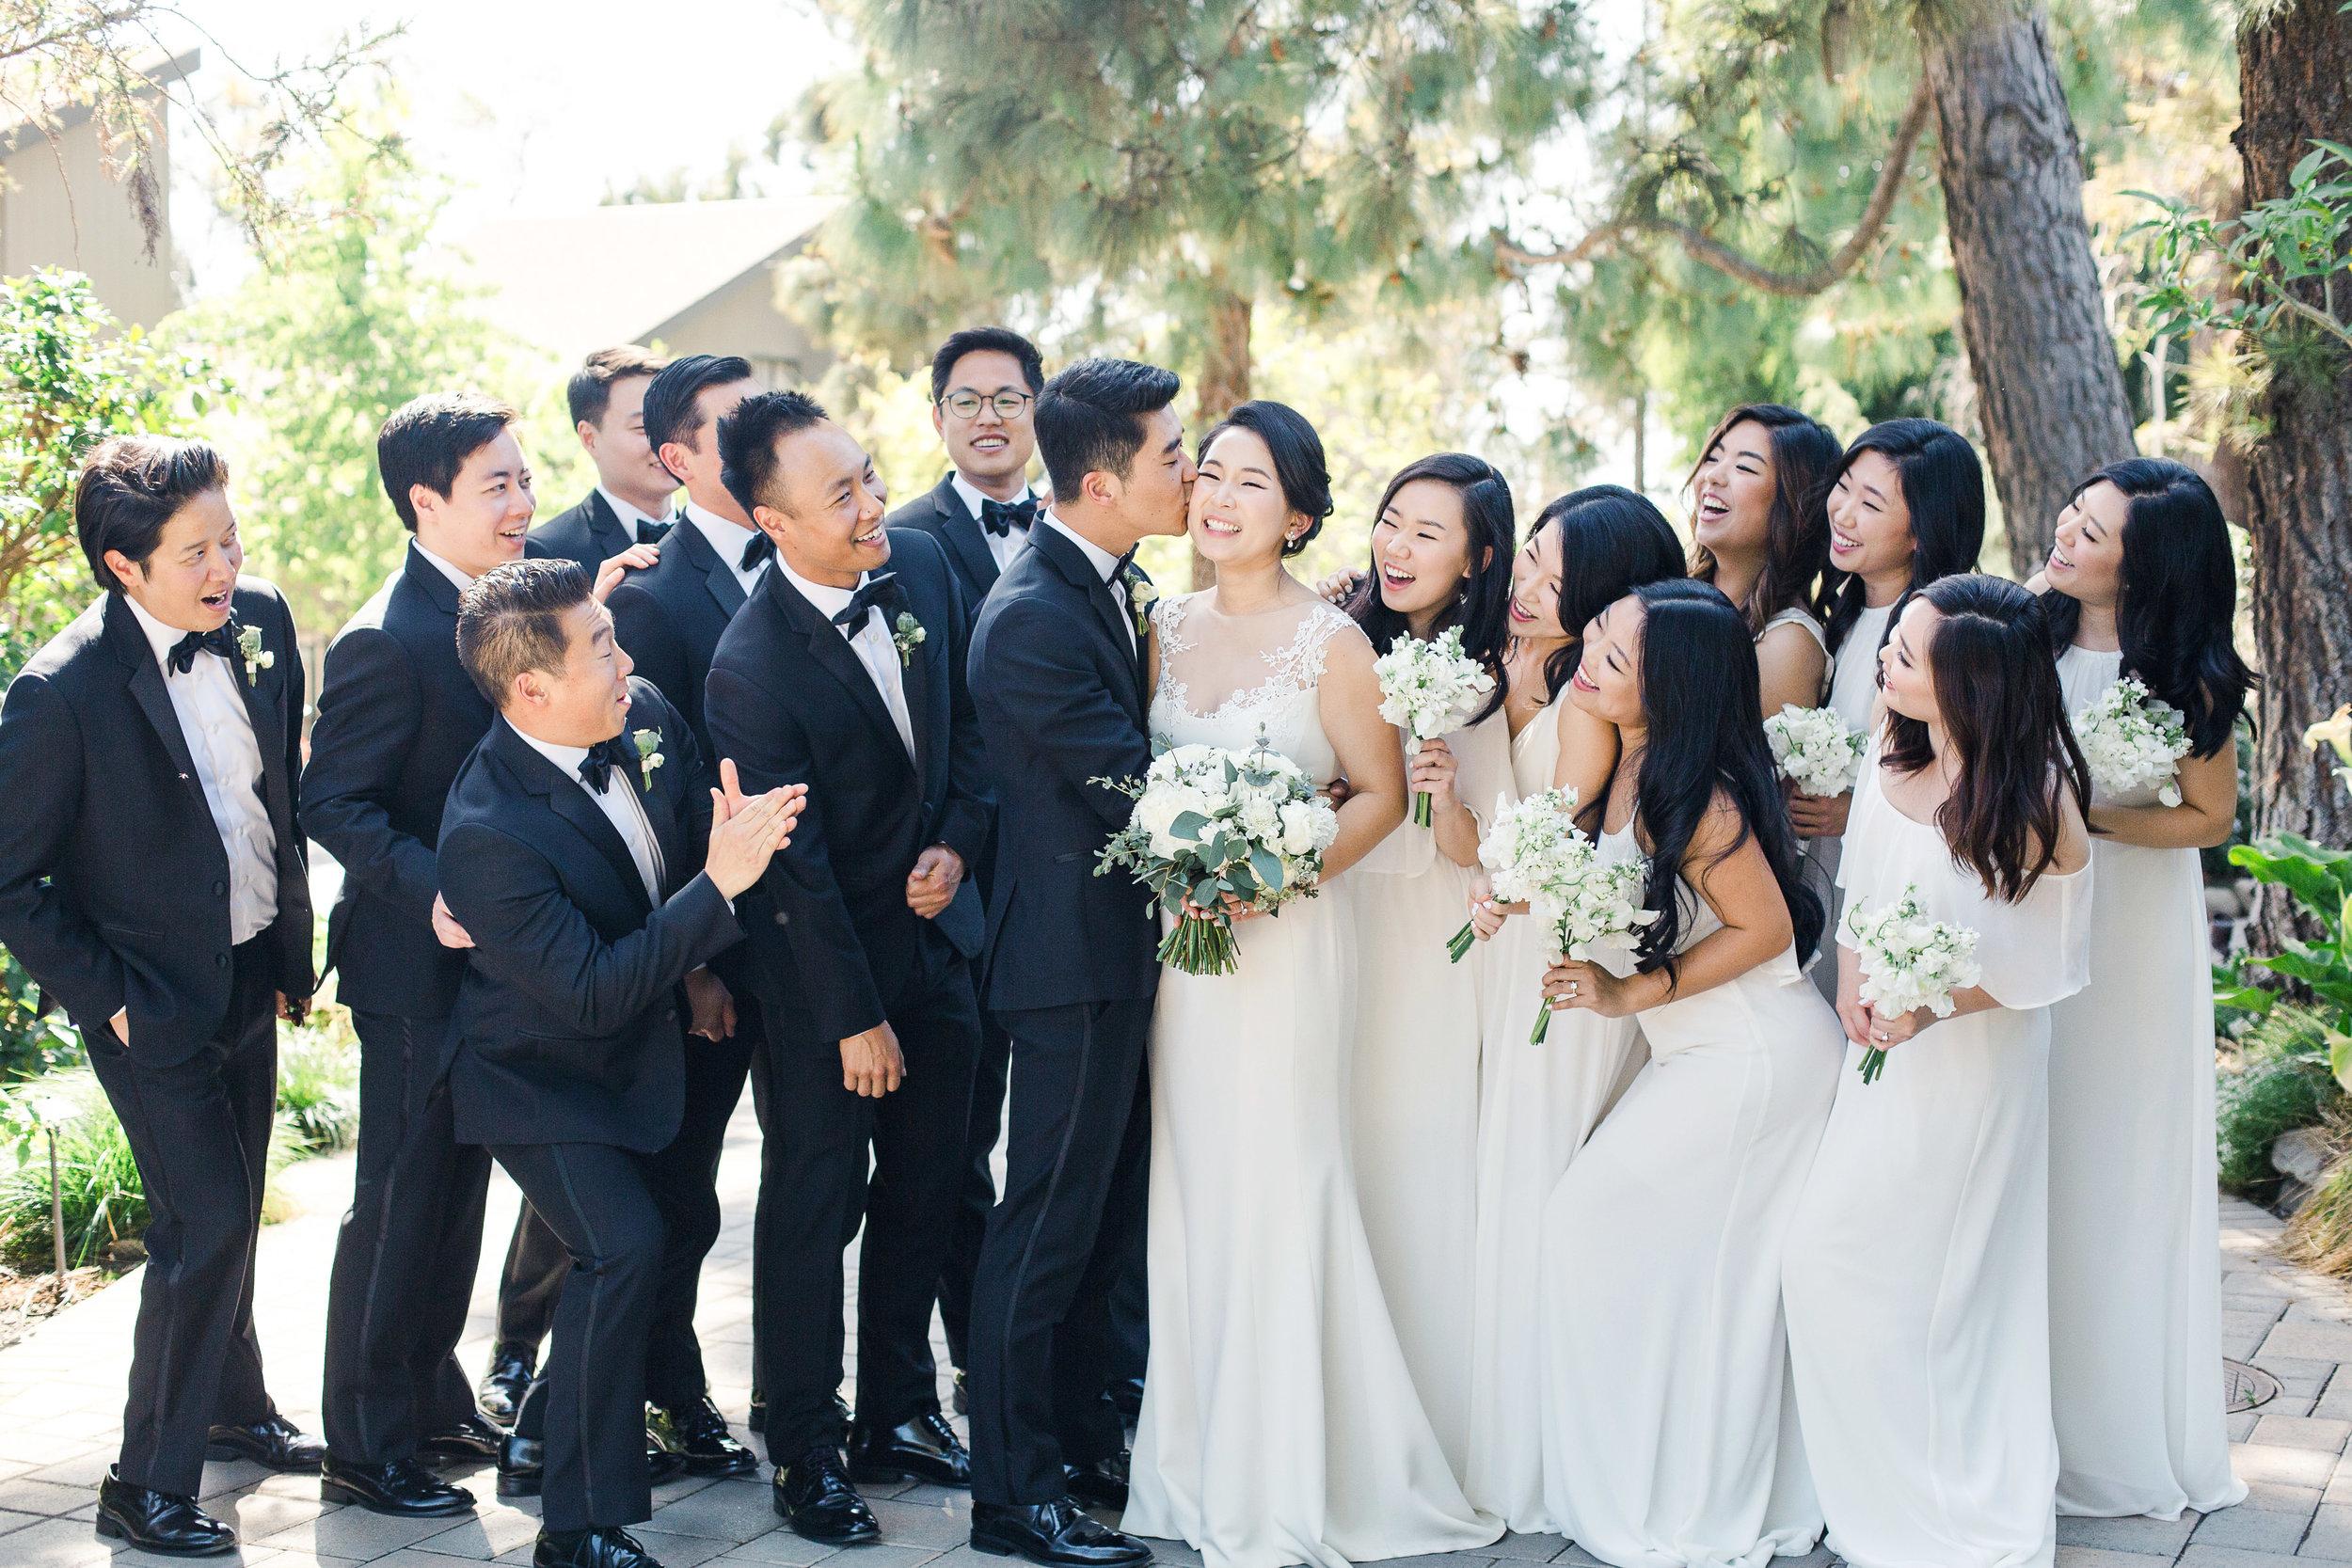 maravilla-gardens-camarillo-los-angeles-ca-california-wedding-pictures-pic0271.jpg